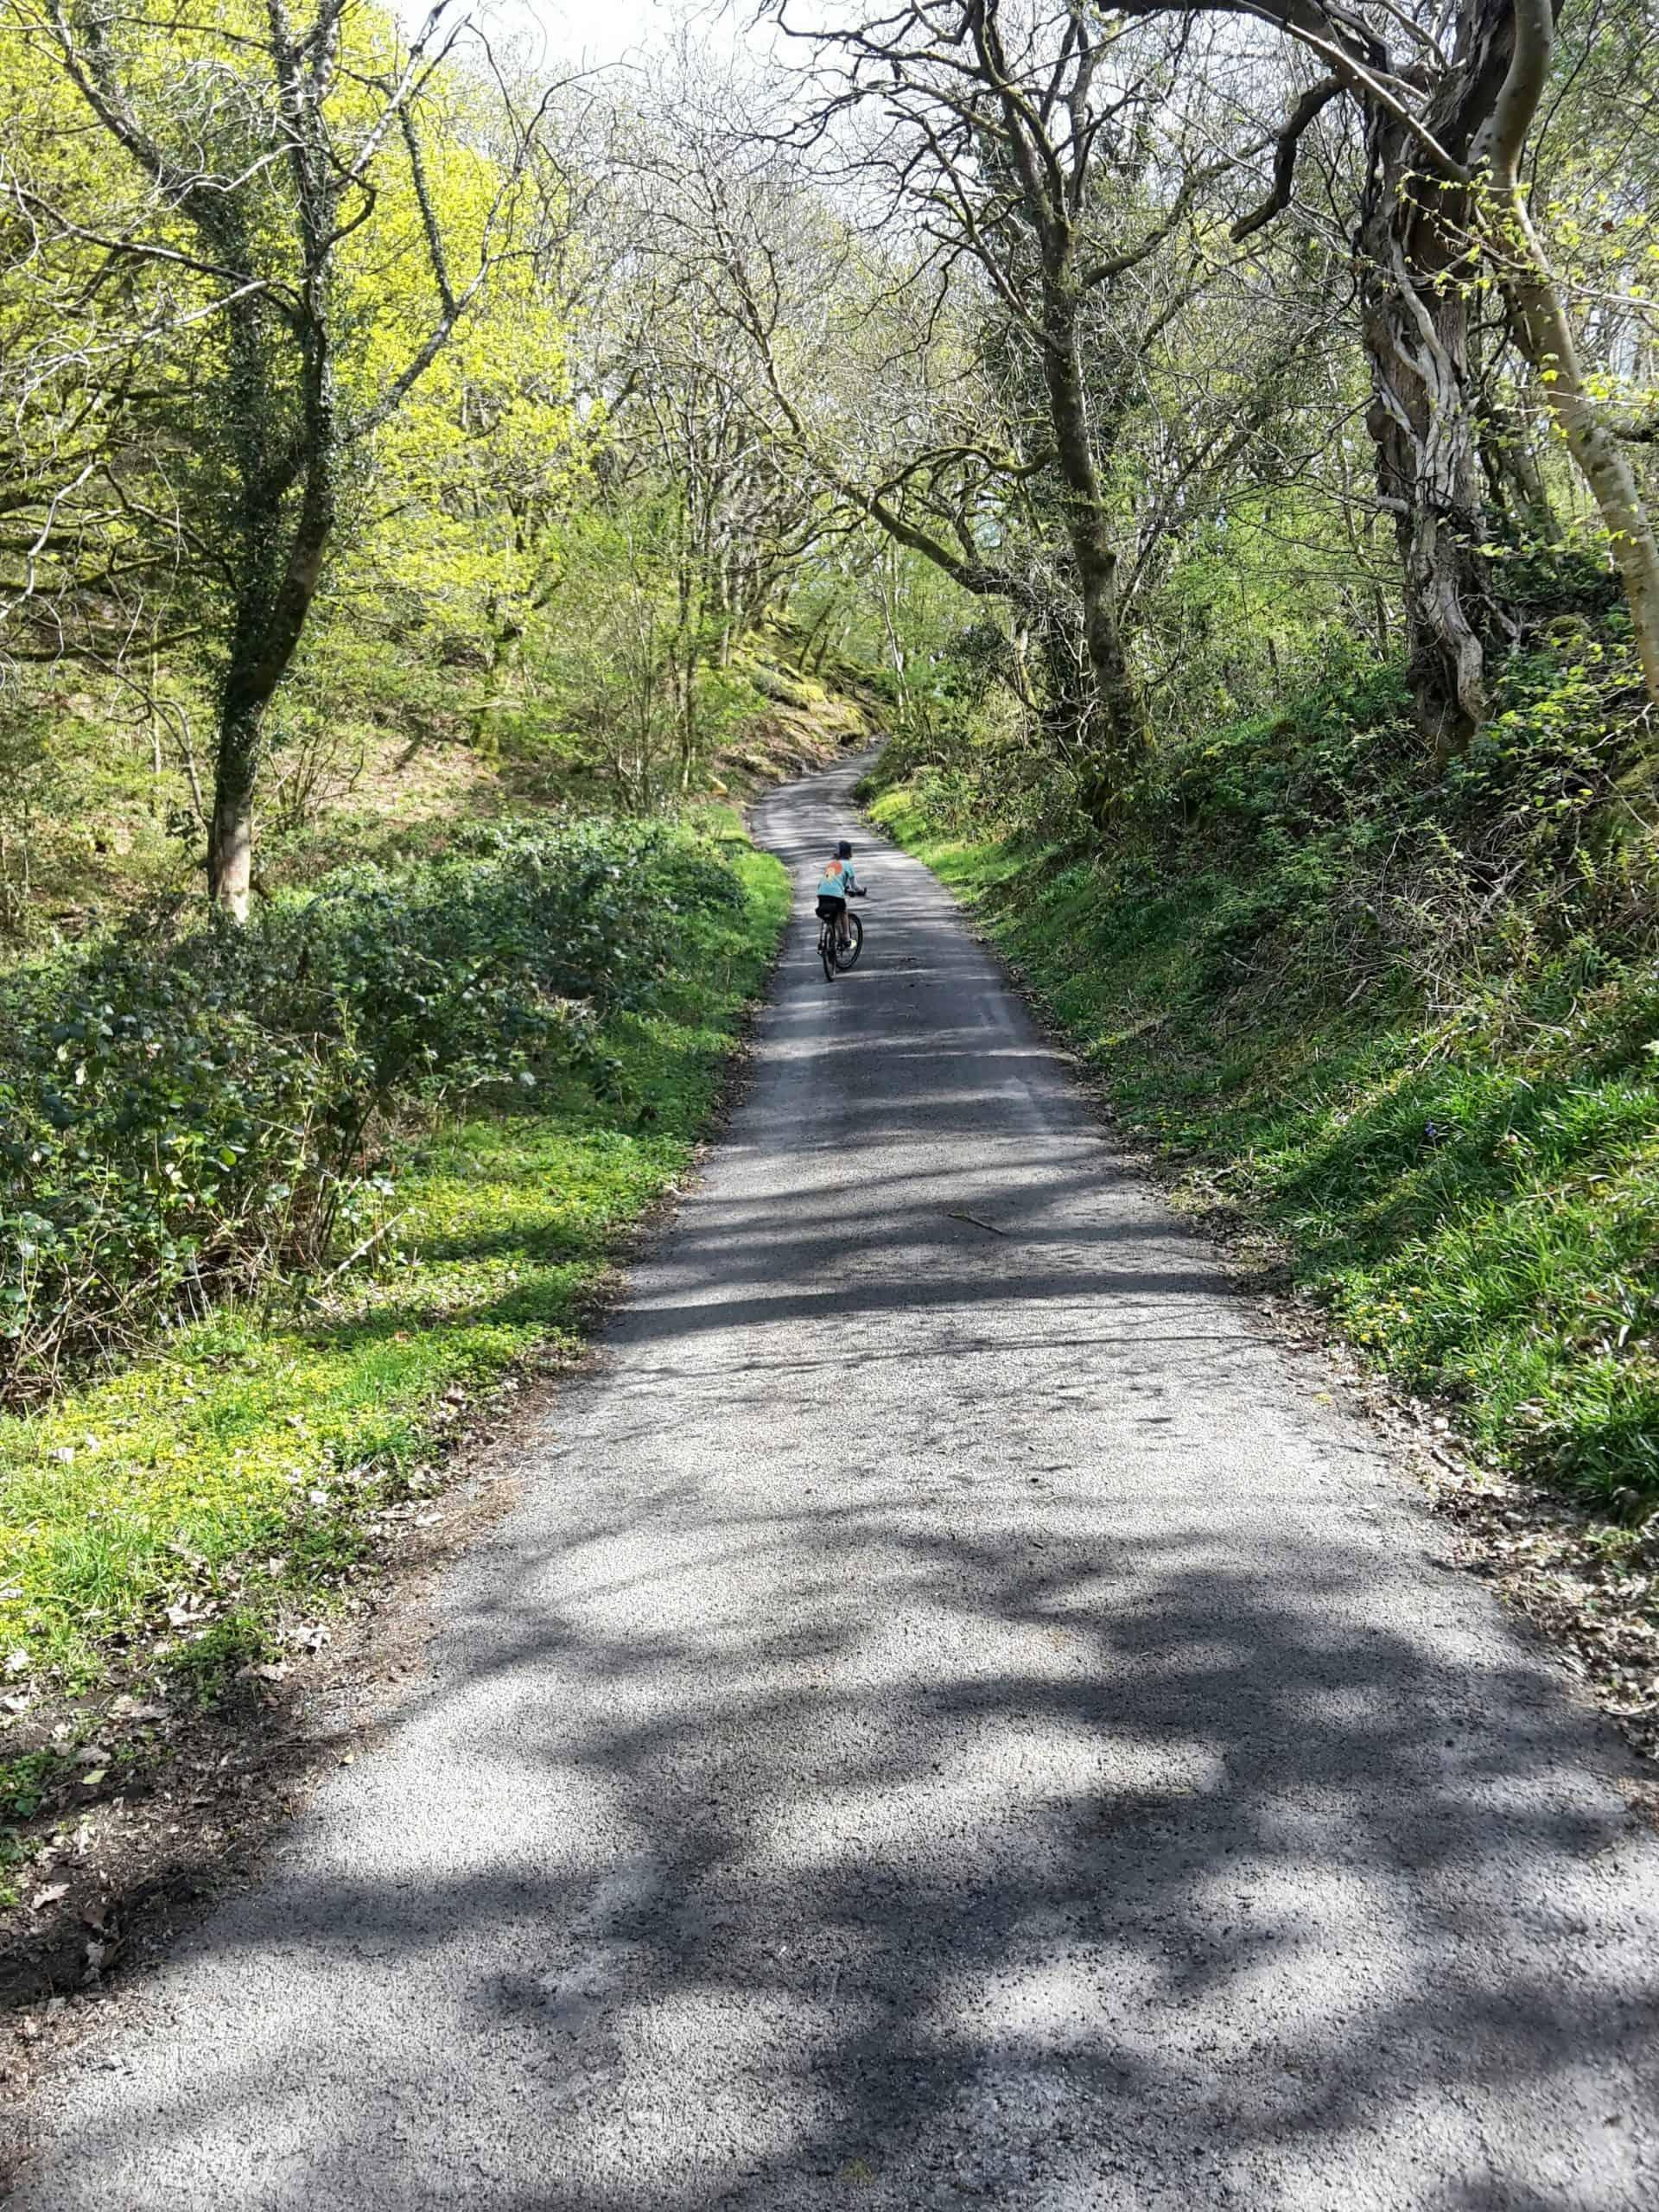 Snowdonia: Climbing Up, Riding Back 79